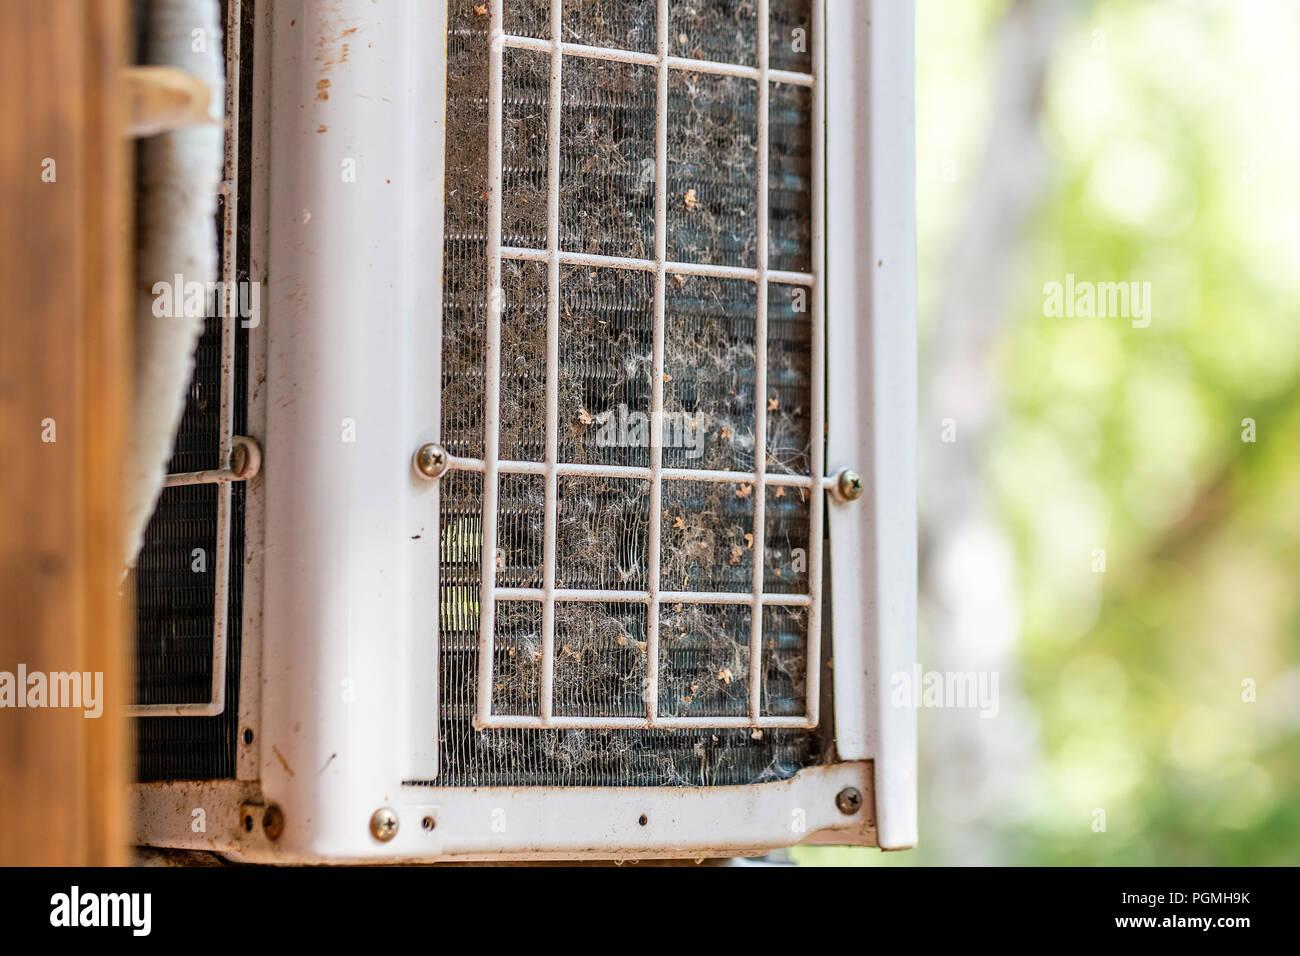 Berühmt Close-up outdoor Klimaanlage mit verschmutzt verstopft Kompressor OB32